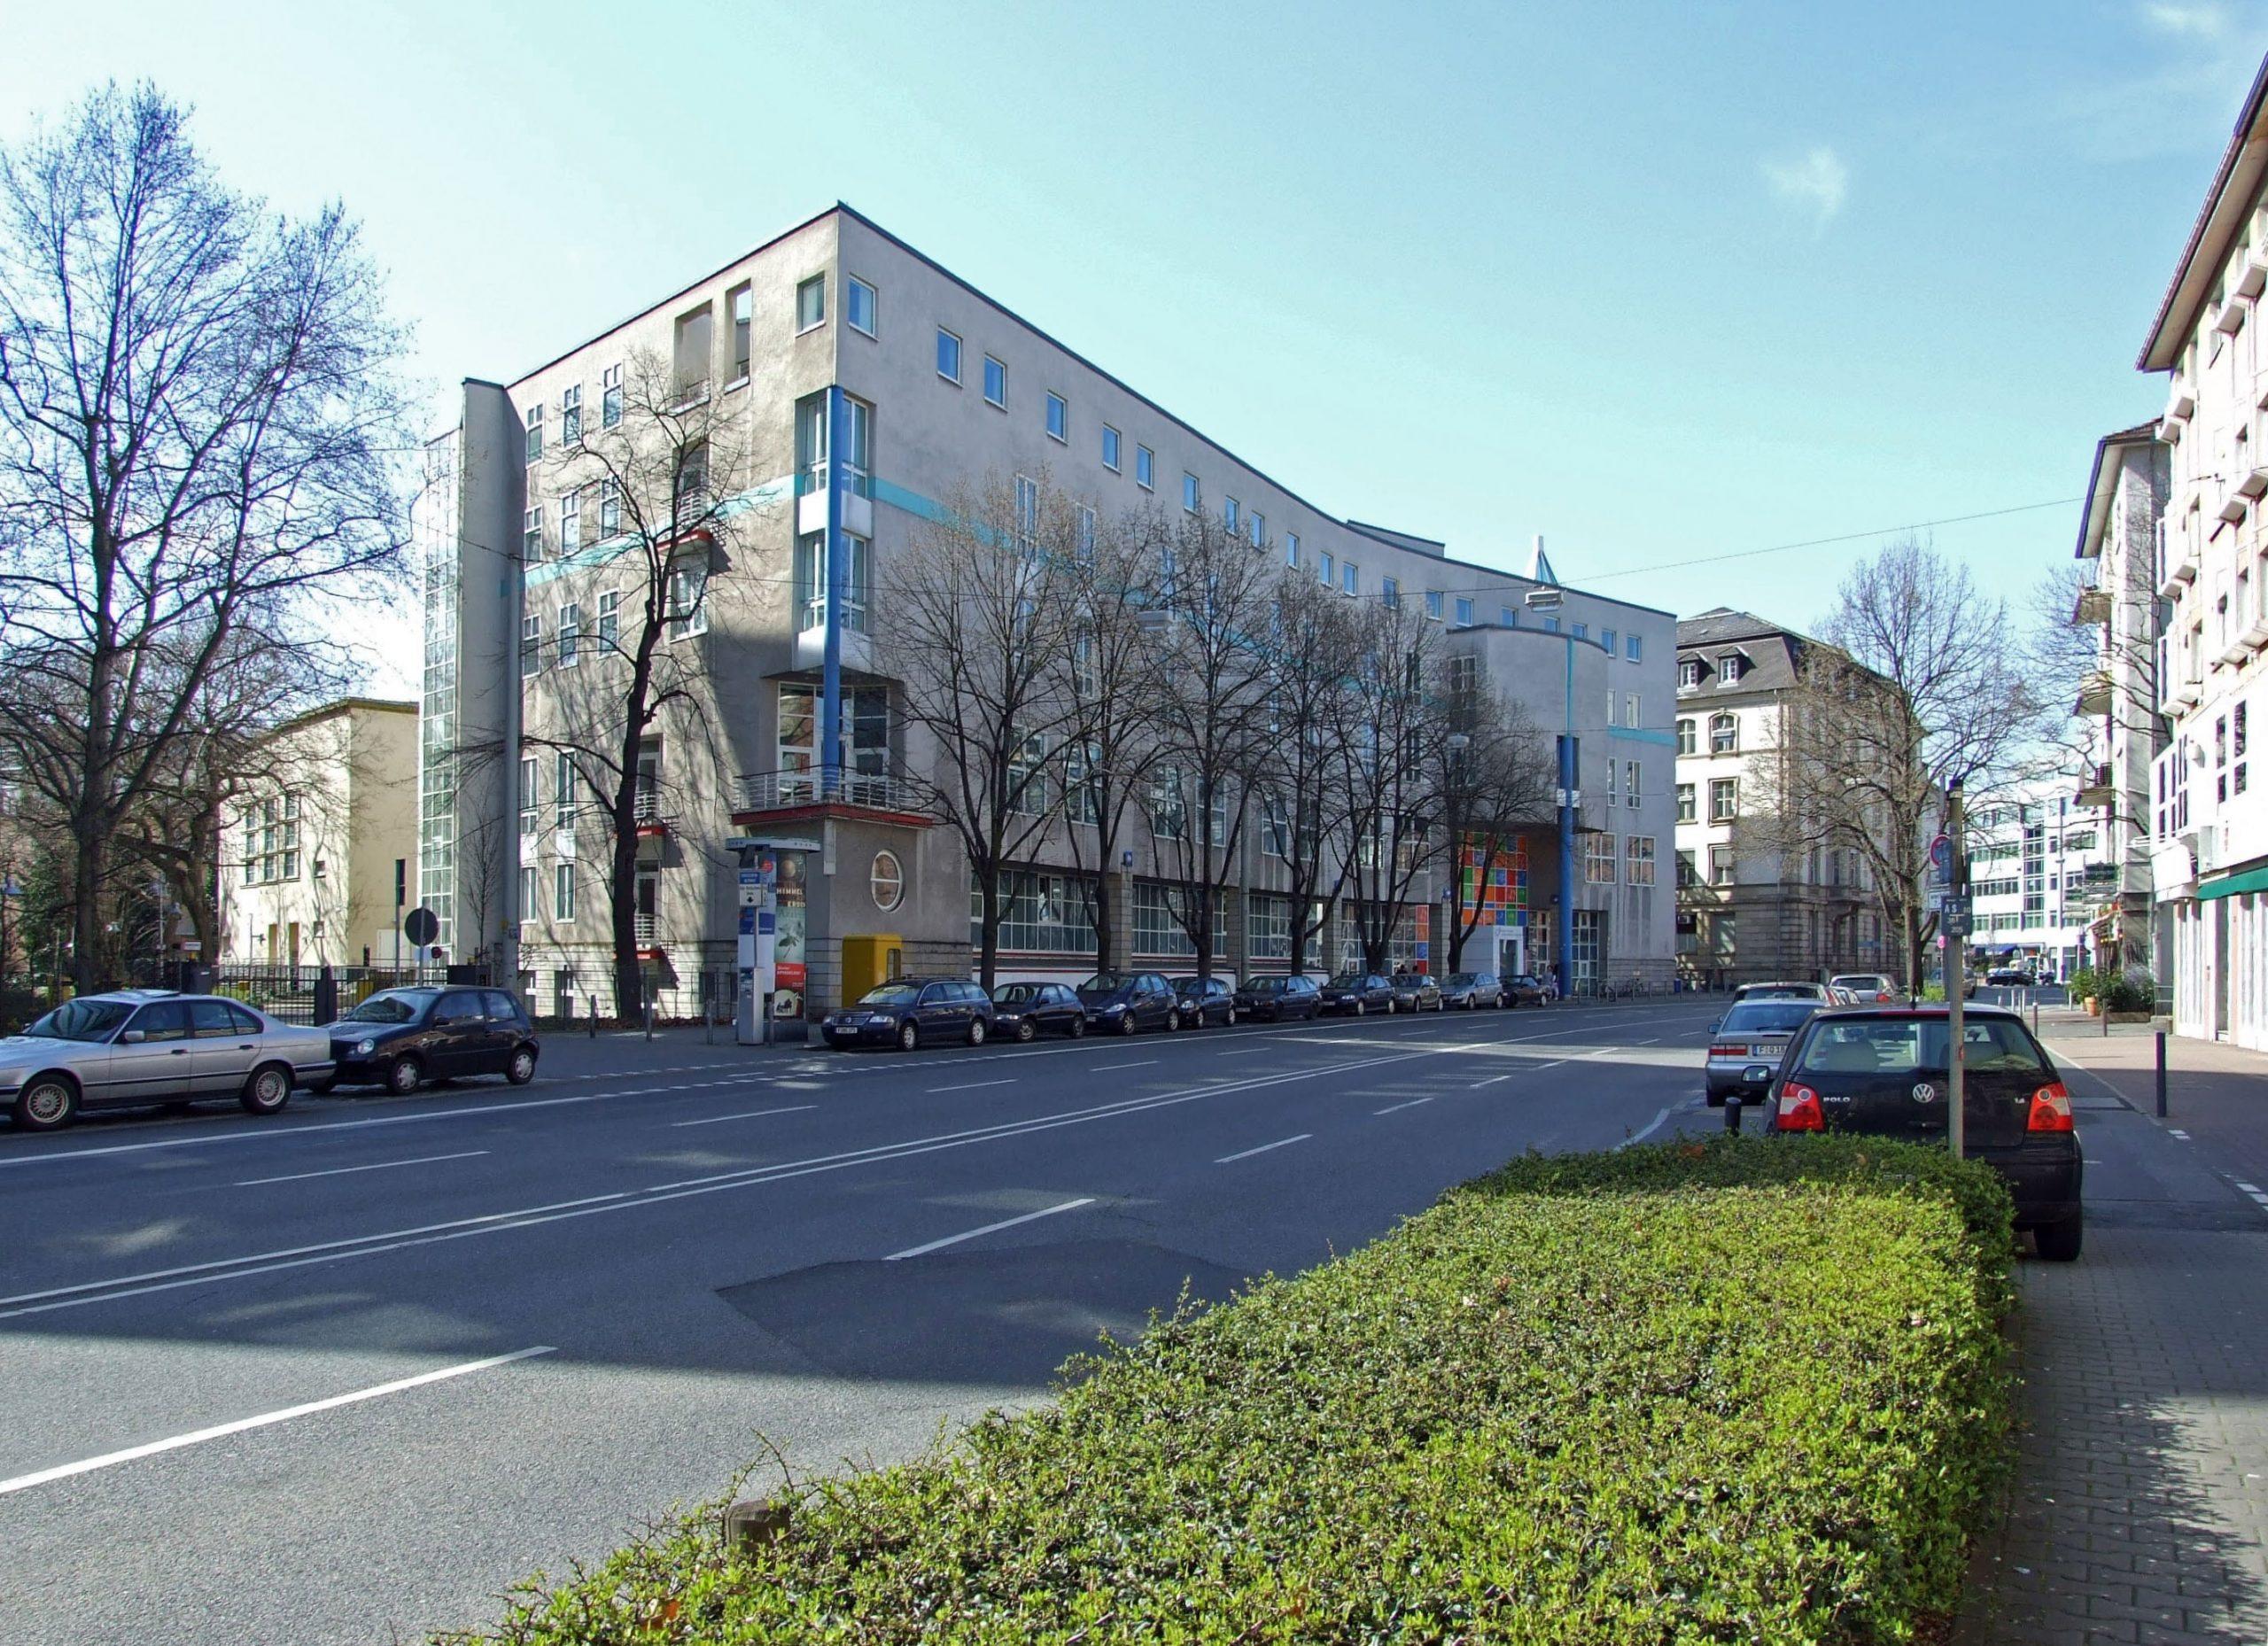 Frankfurt University of Music and Performing Arts